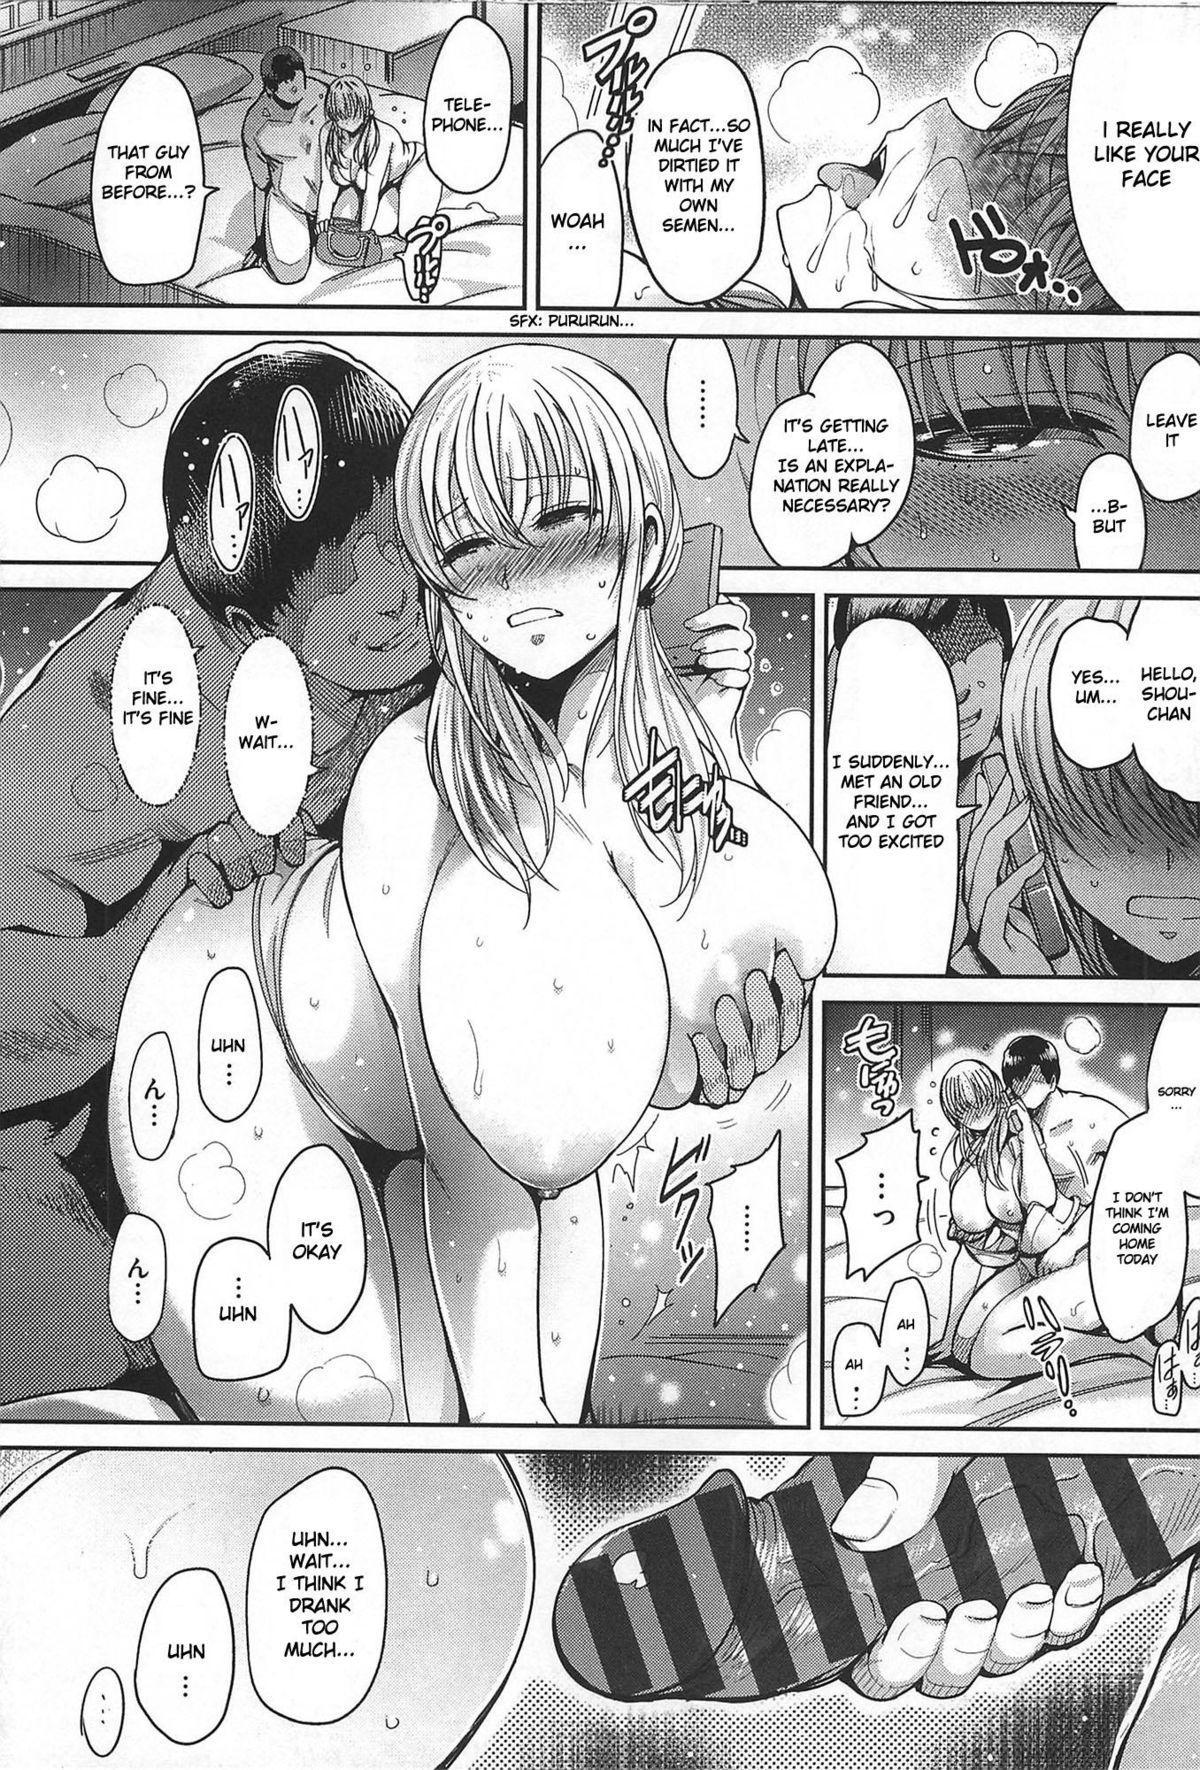 [Ichimatsu] [For my Husband's Sake] 9